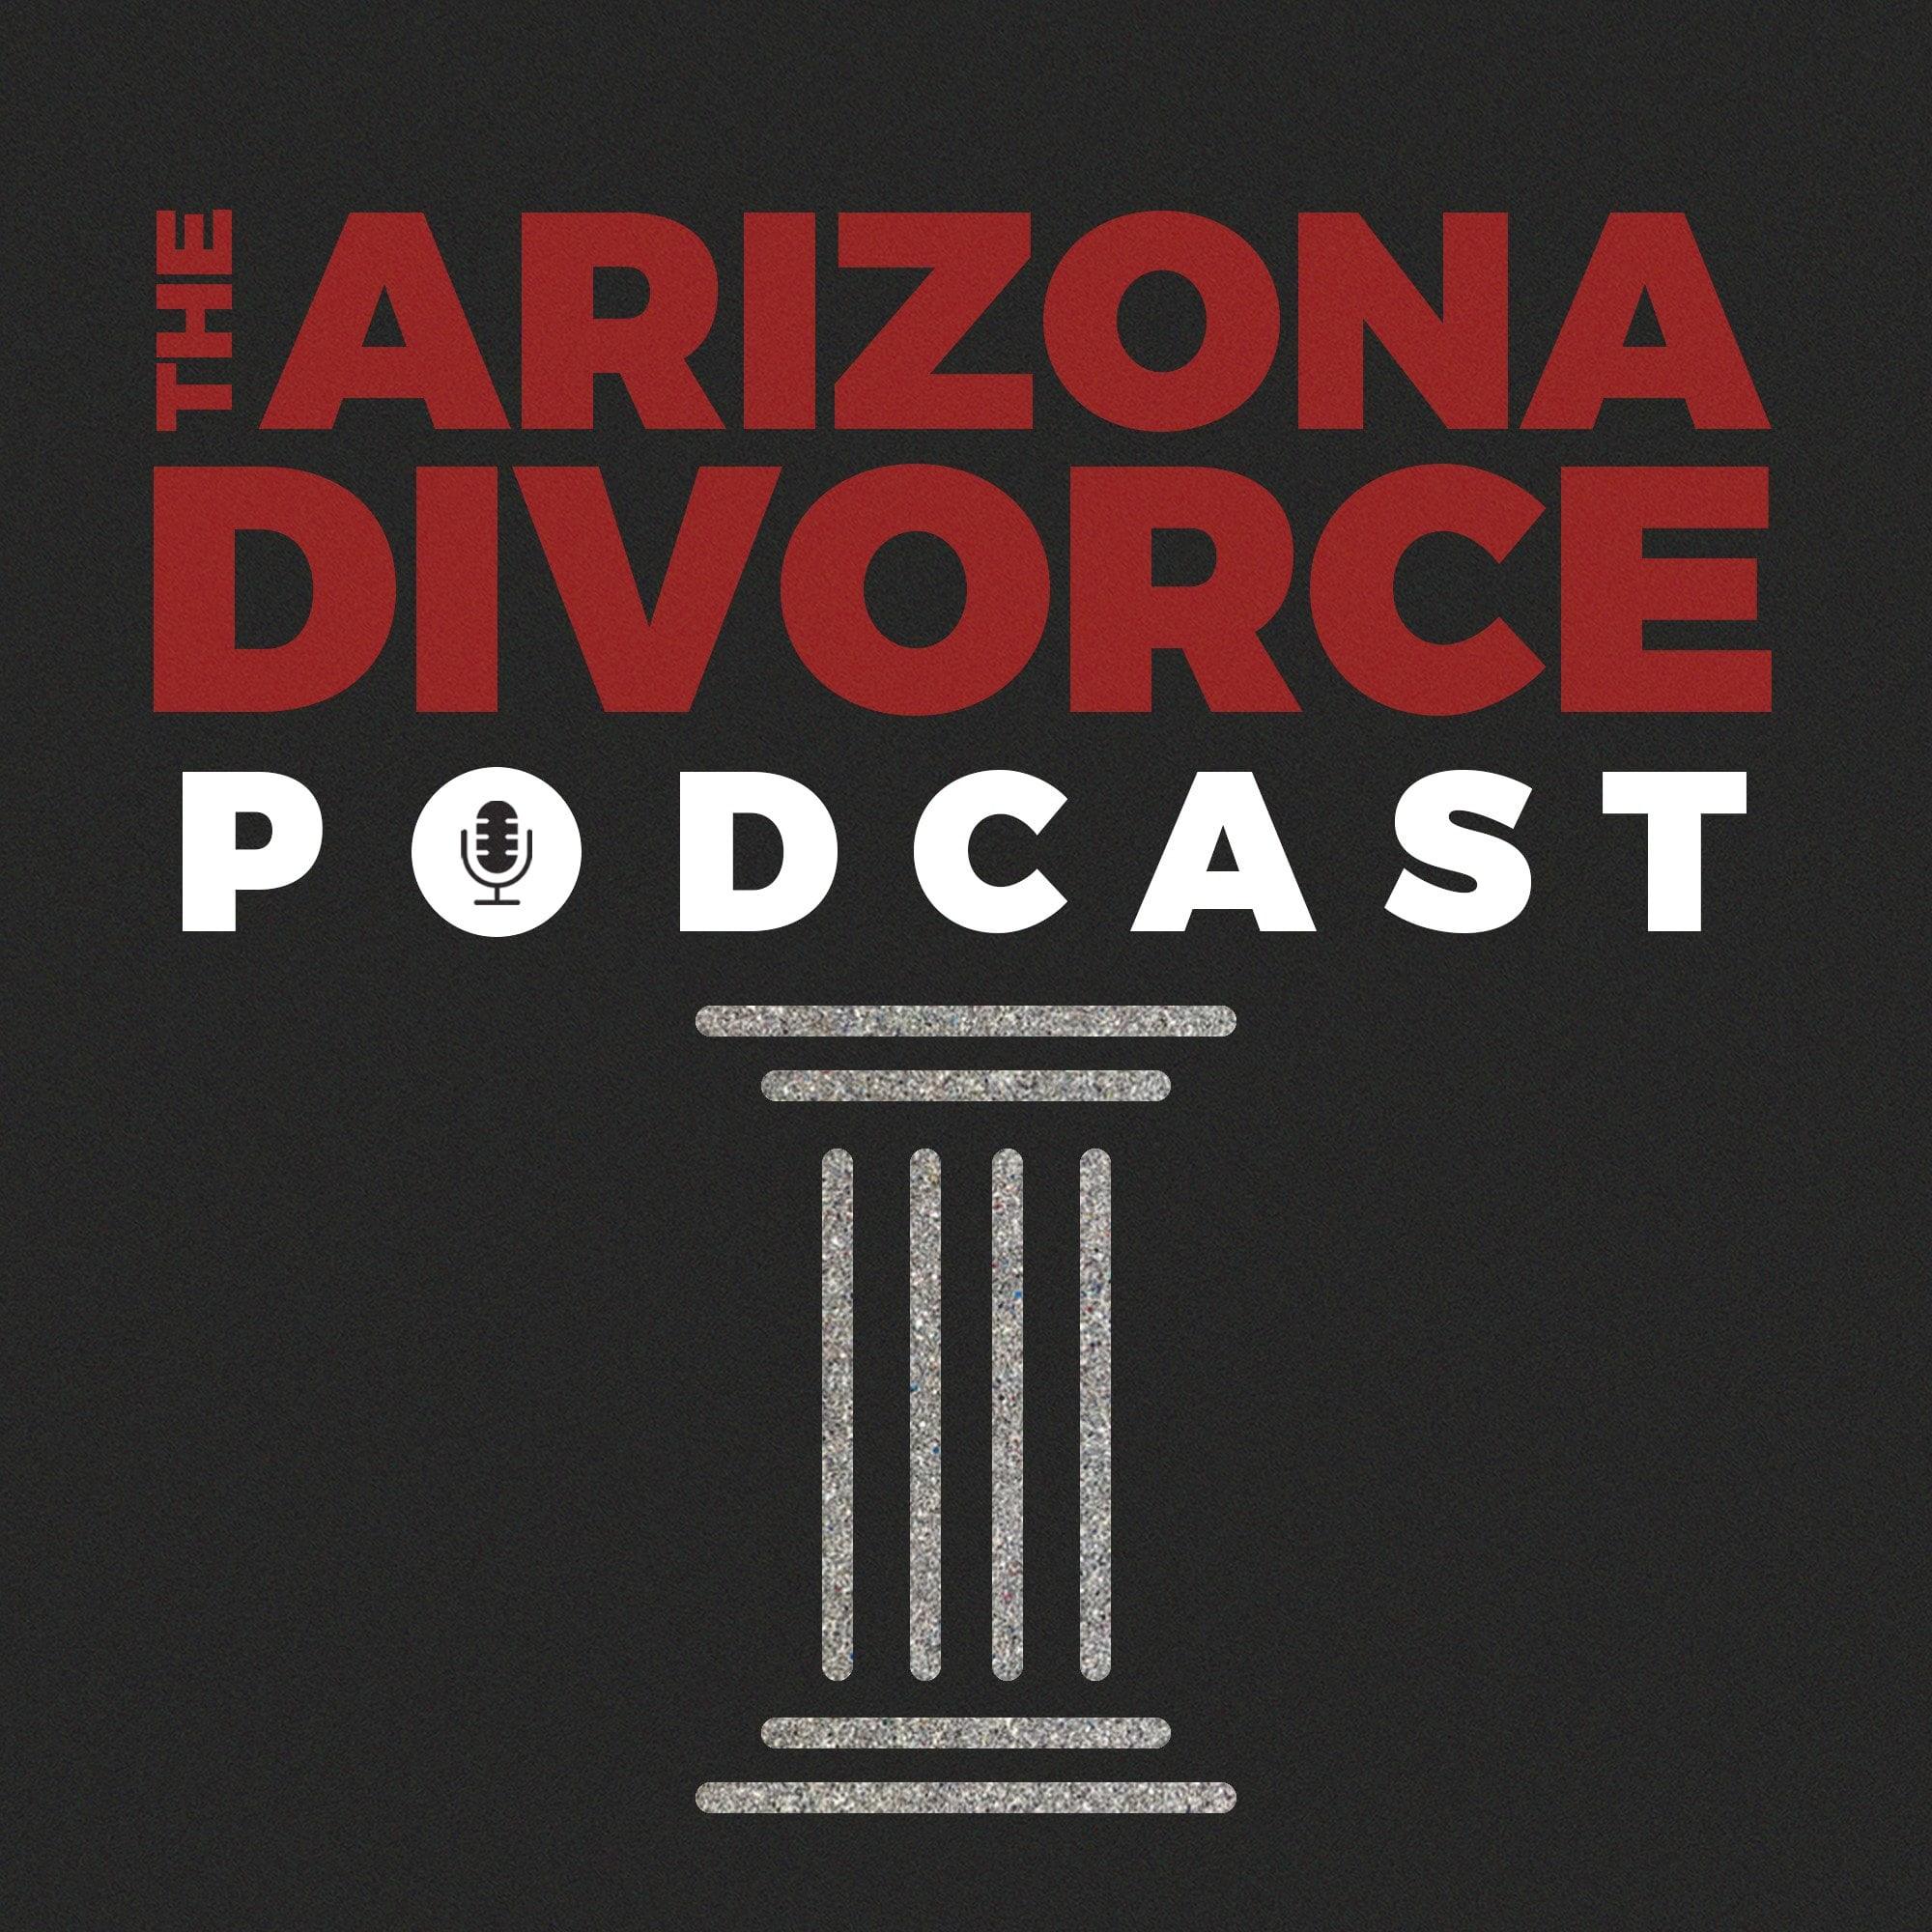 Arizona Divorce Podcast | Listen via Stitcher for Podcasts